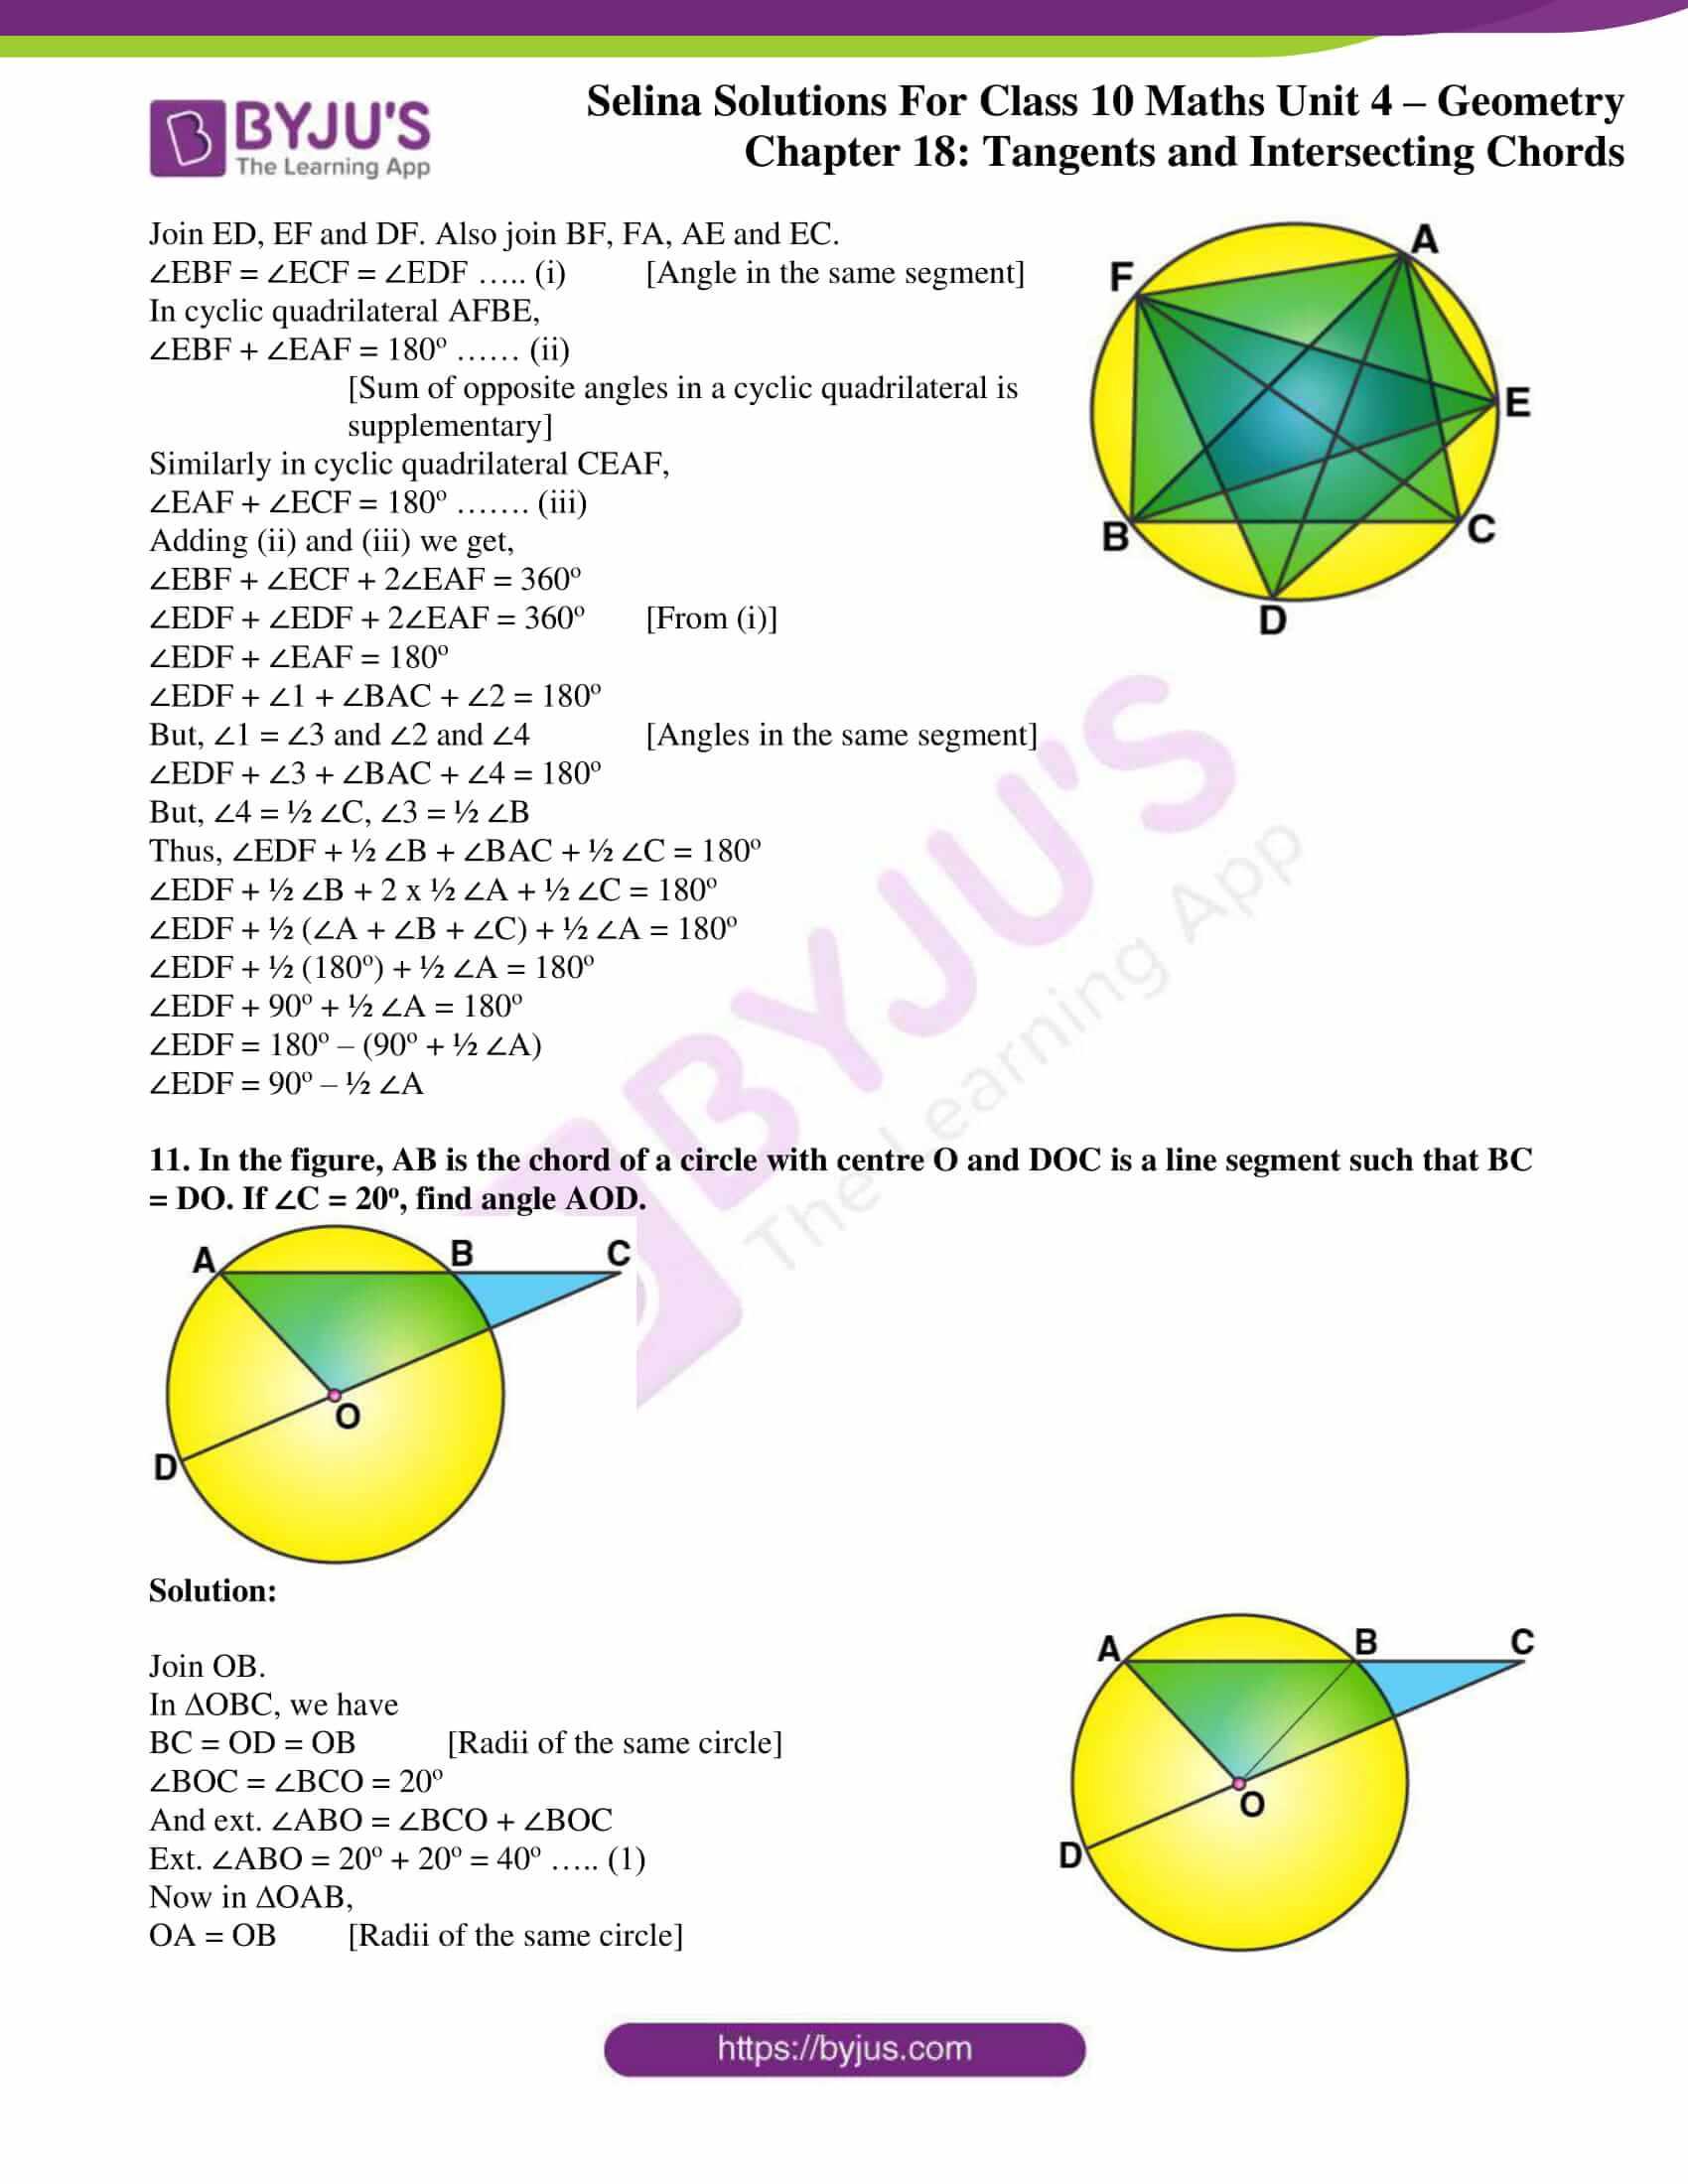 selina-sol-maths-class-10-ch-18-ex-c-06